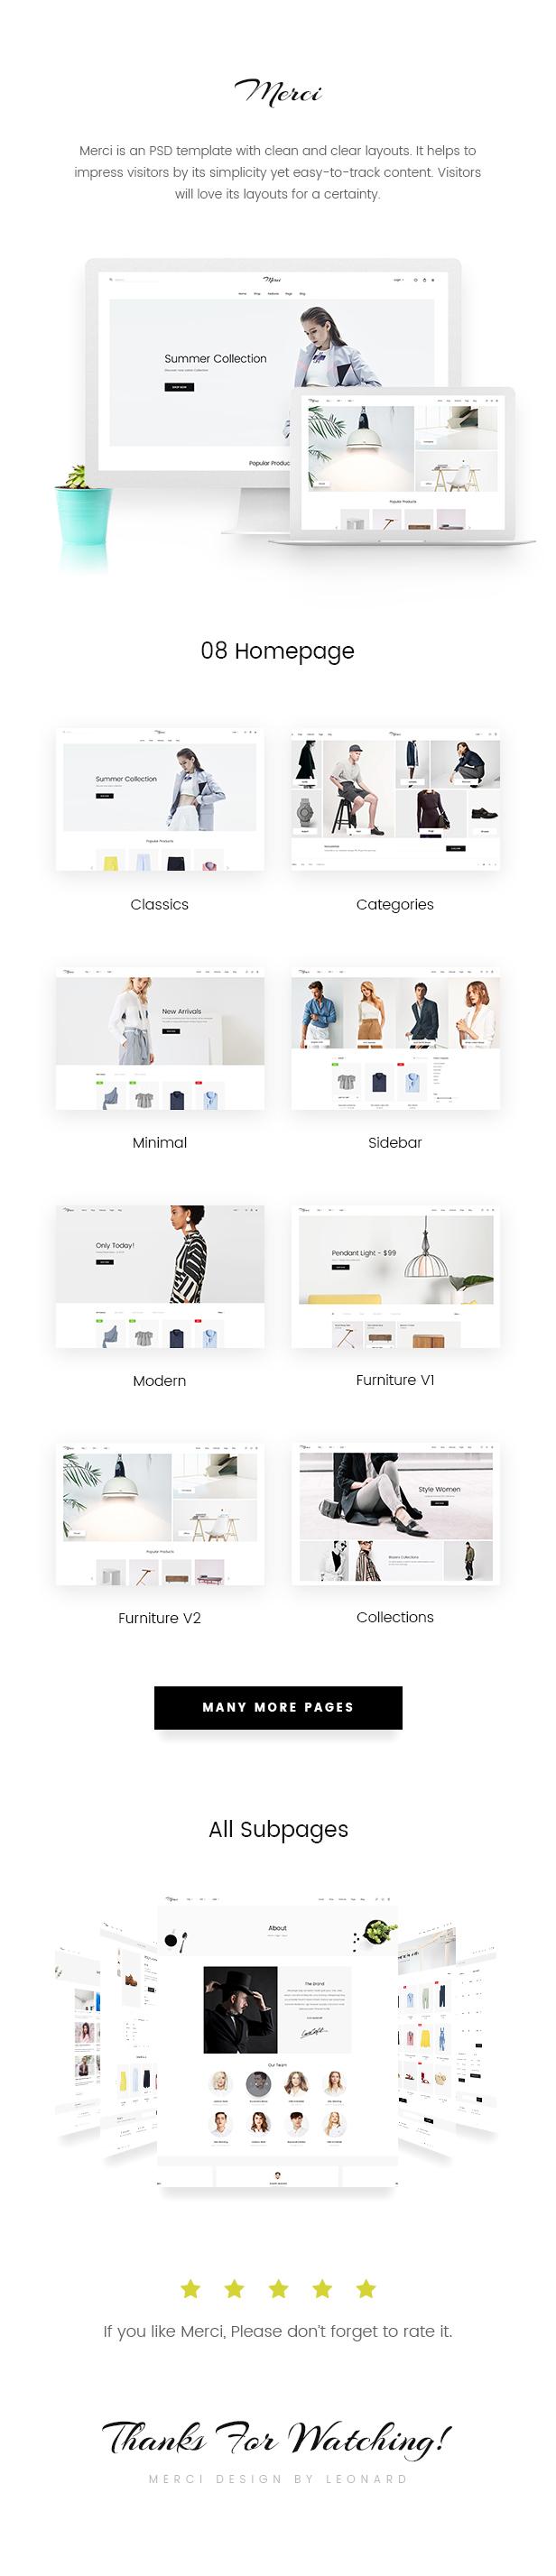 Merci | Minimalist eCommerce PSD Template - 1